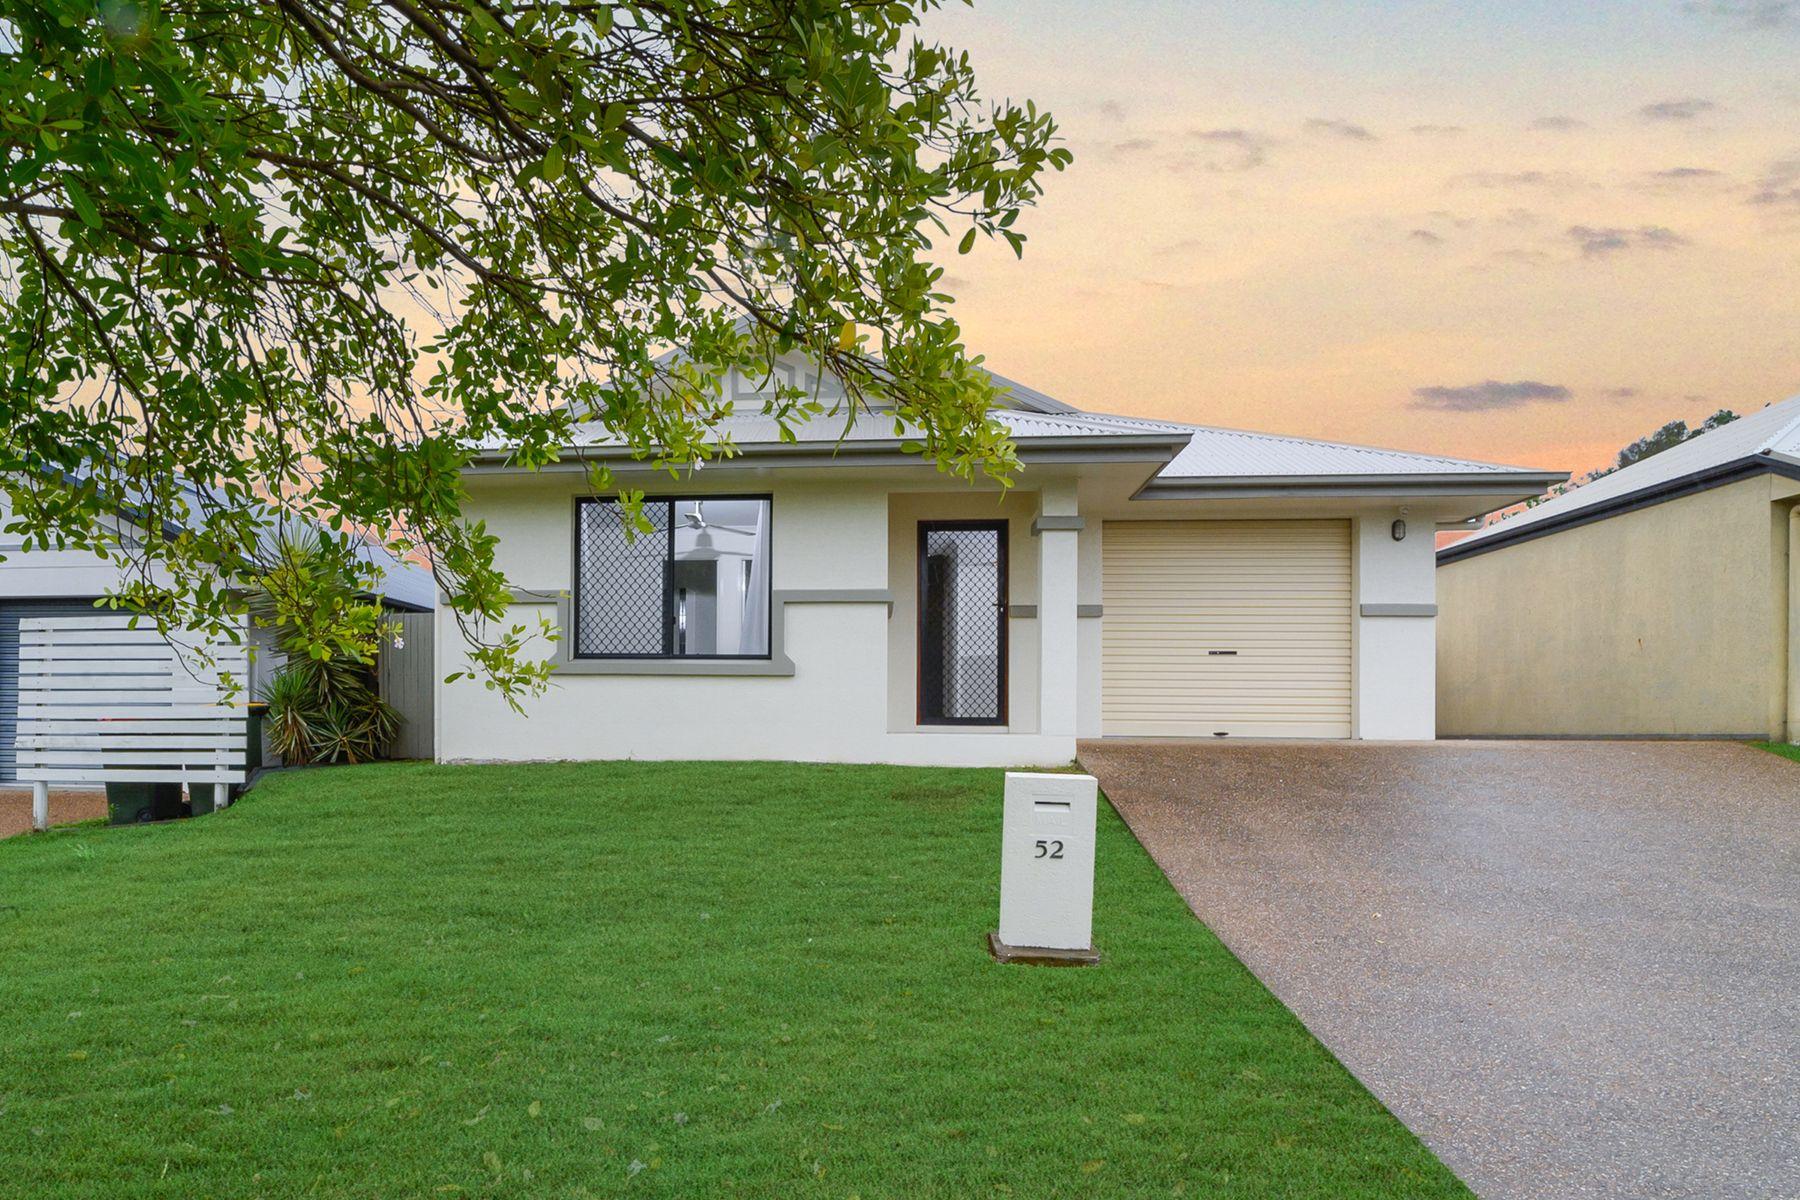 52 Freshwater Drive, Douglas, QLD 4814